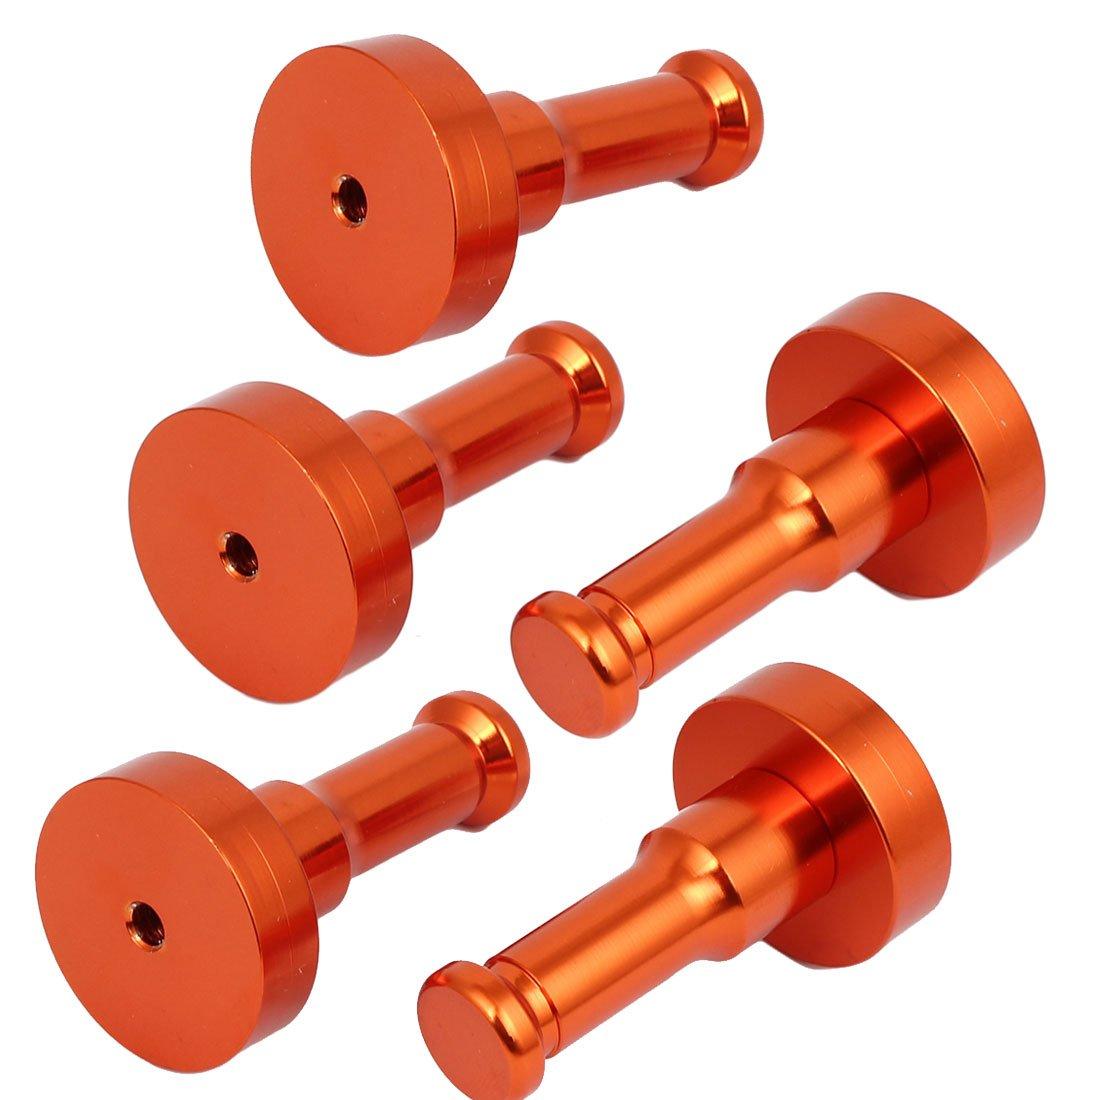 uxcell Decorative Aluminium Hanger Clothes Holder Round Robe Hook Orange 5pcs